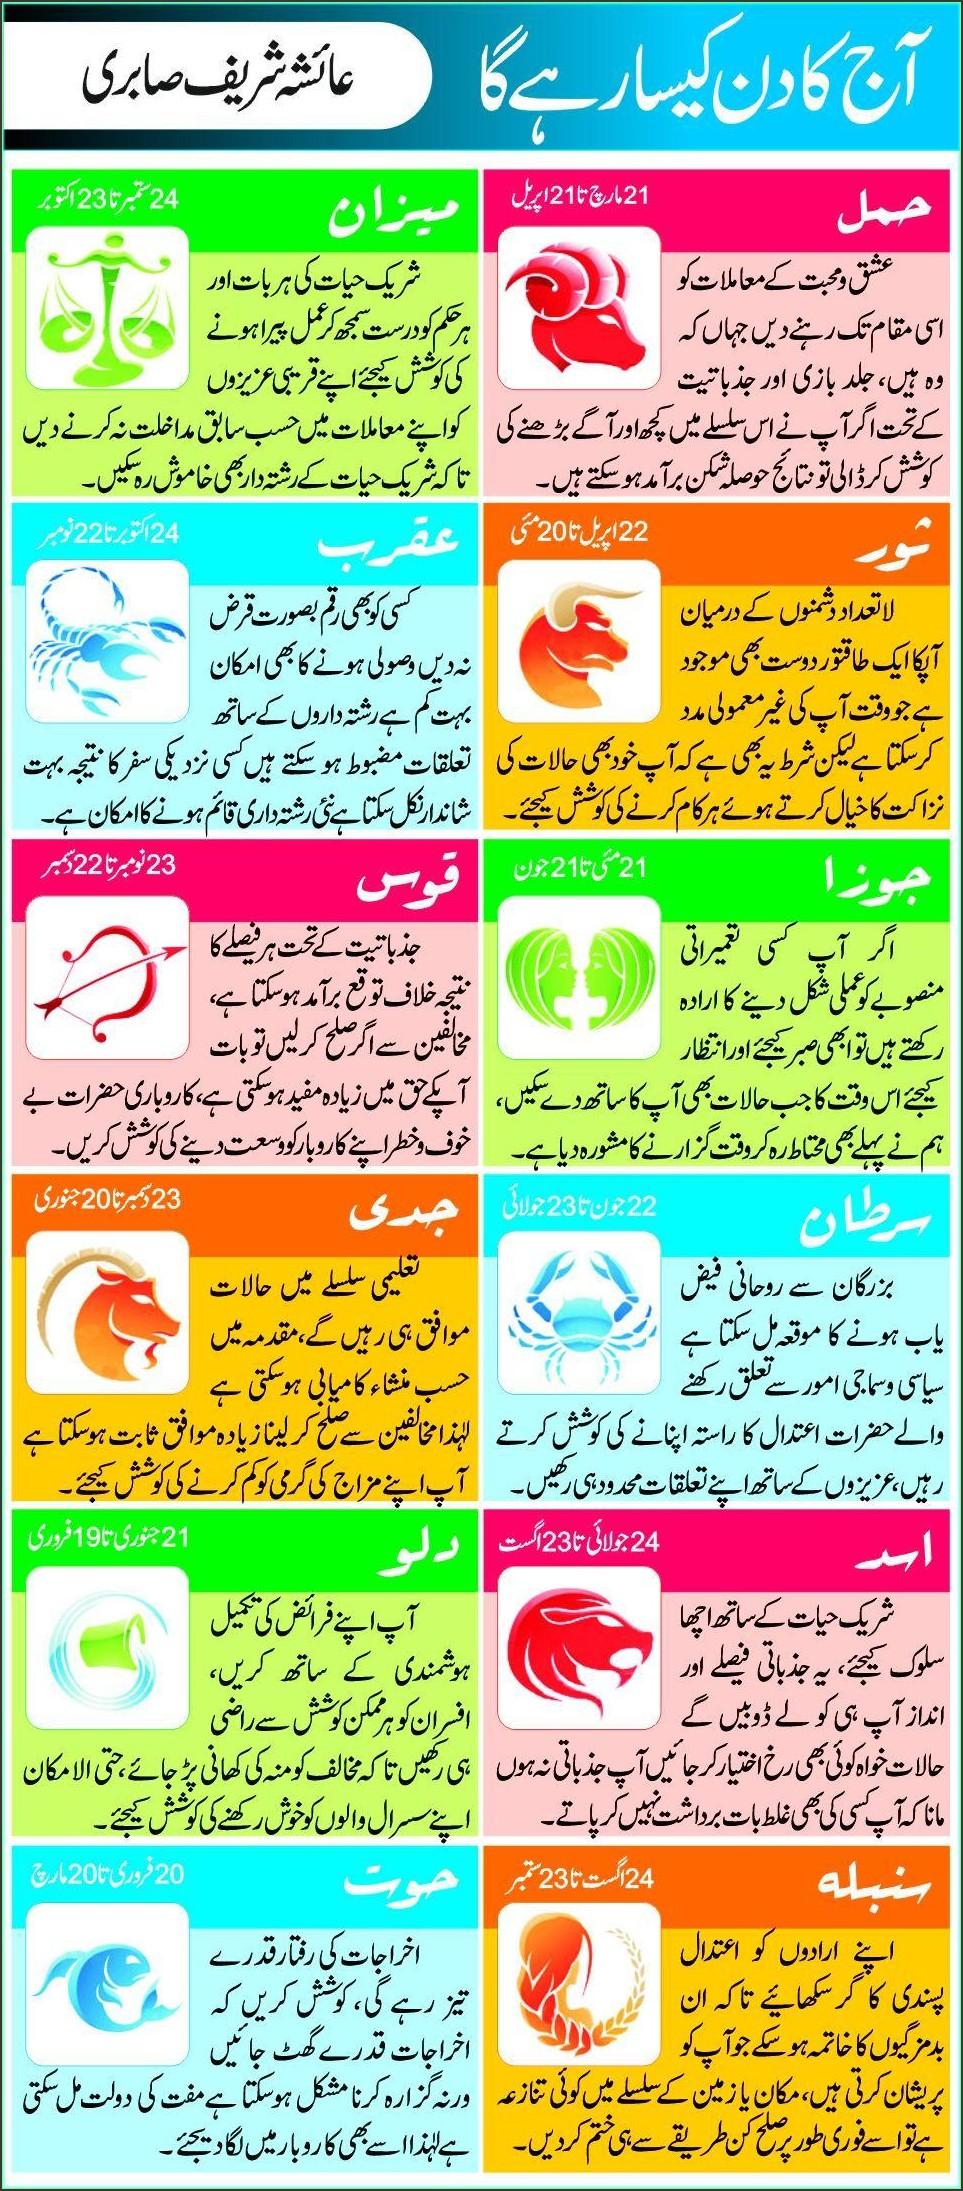 Urdu Horoscope Today 7th March 2016